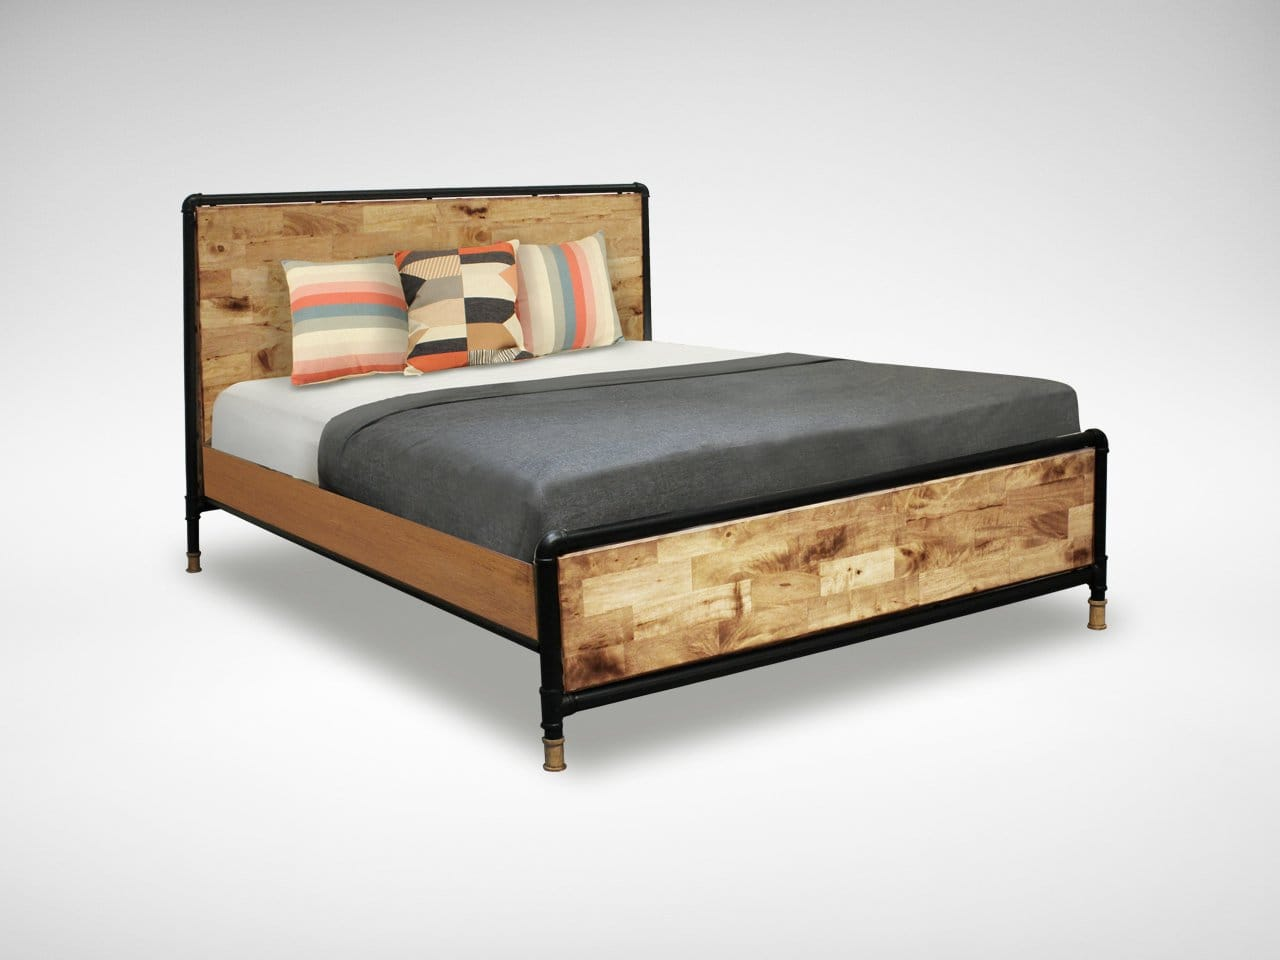 Pipe Bed Frames for Sale Singapore – King Size | Comfort Design ...